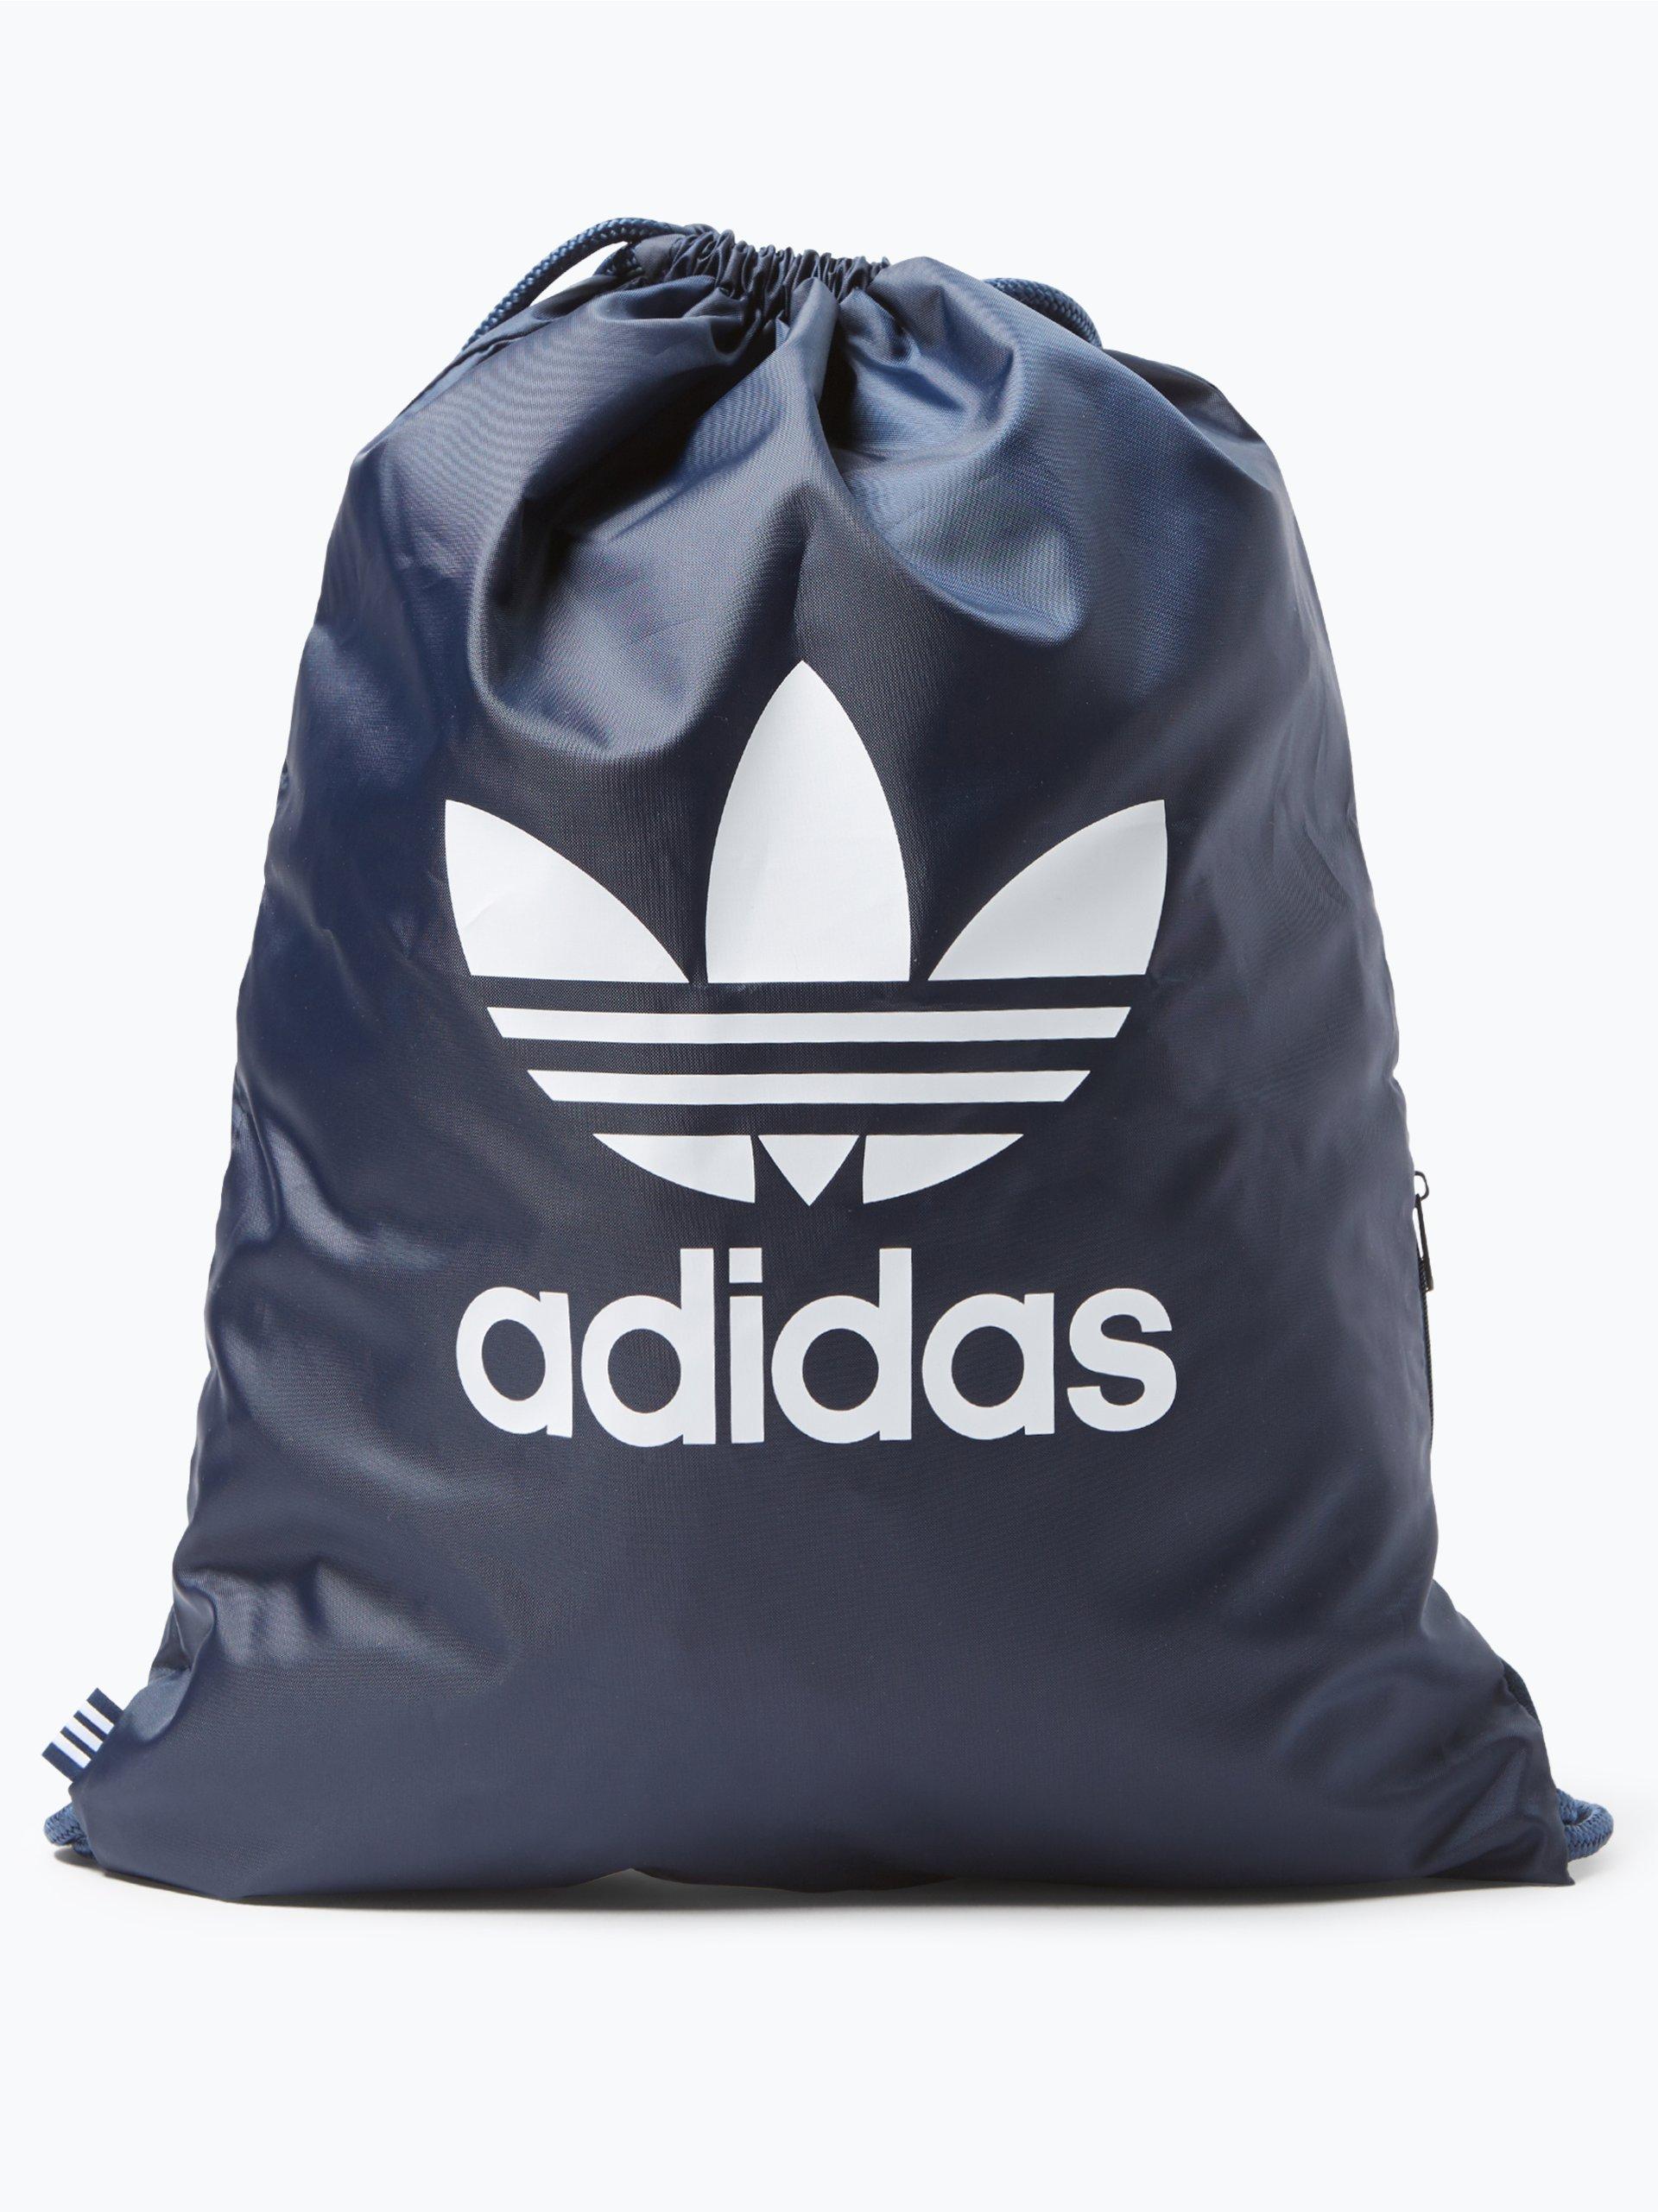 adidas Originals Męski worek sportowy